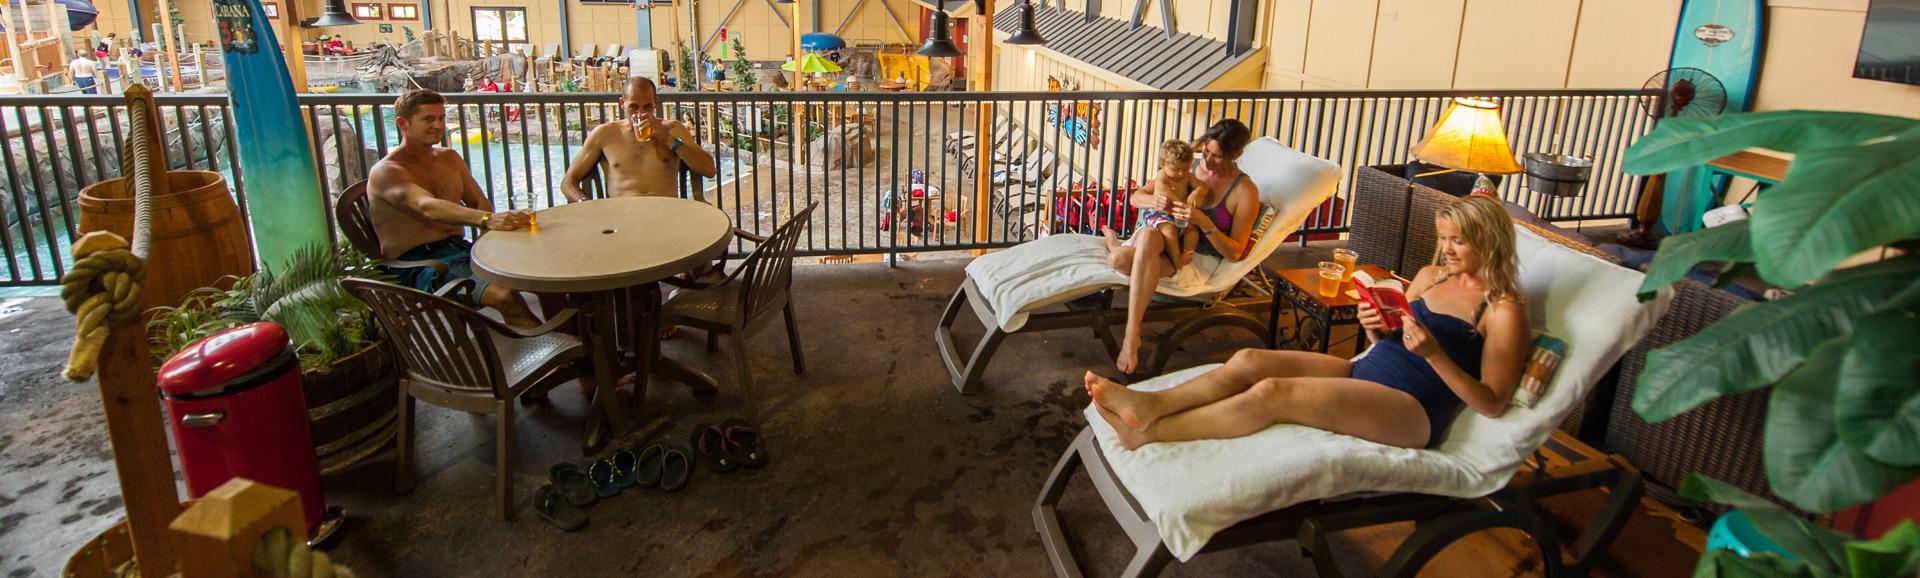 Cabana Rental desktop image